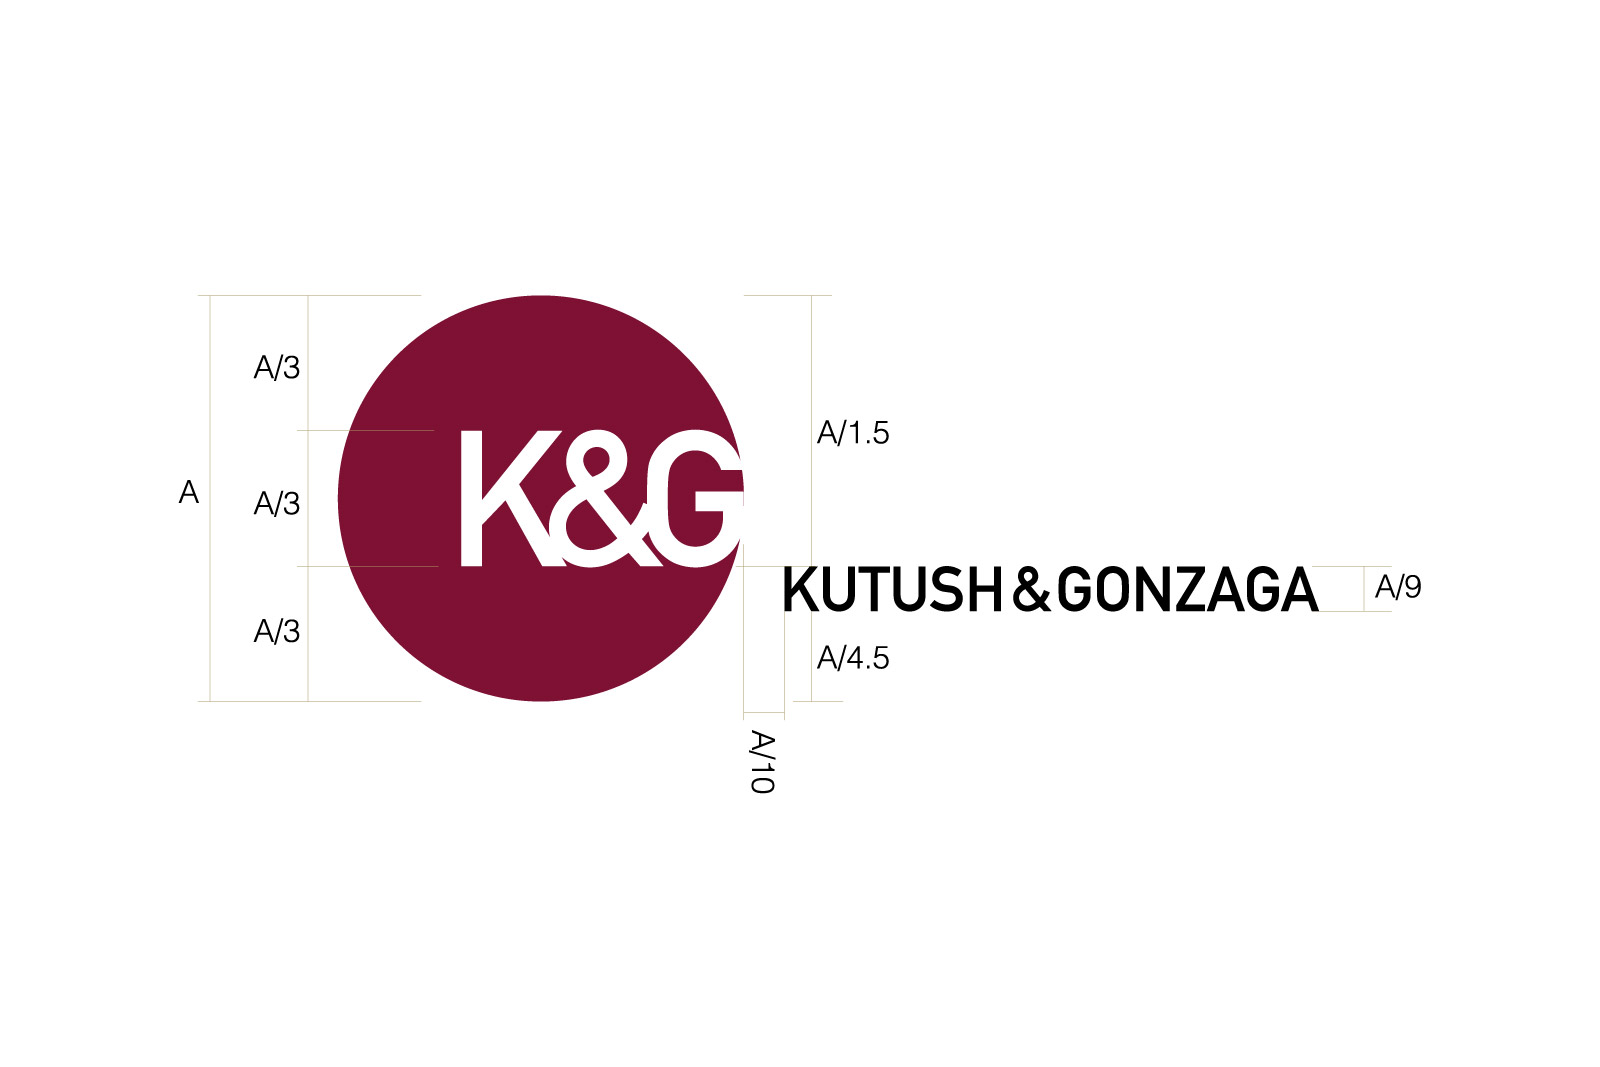 Asgard Branding, corporate identity, K&G, logo, Kutush & Gonzaga, design, store branding, retaile, branding, logo layout, Logo constuction, logo configuration, logo guide, guidelines